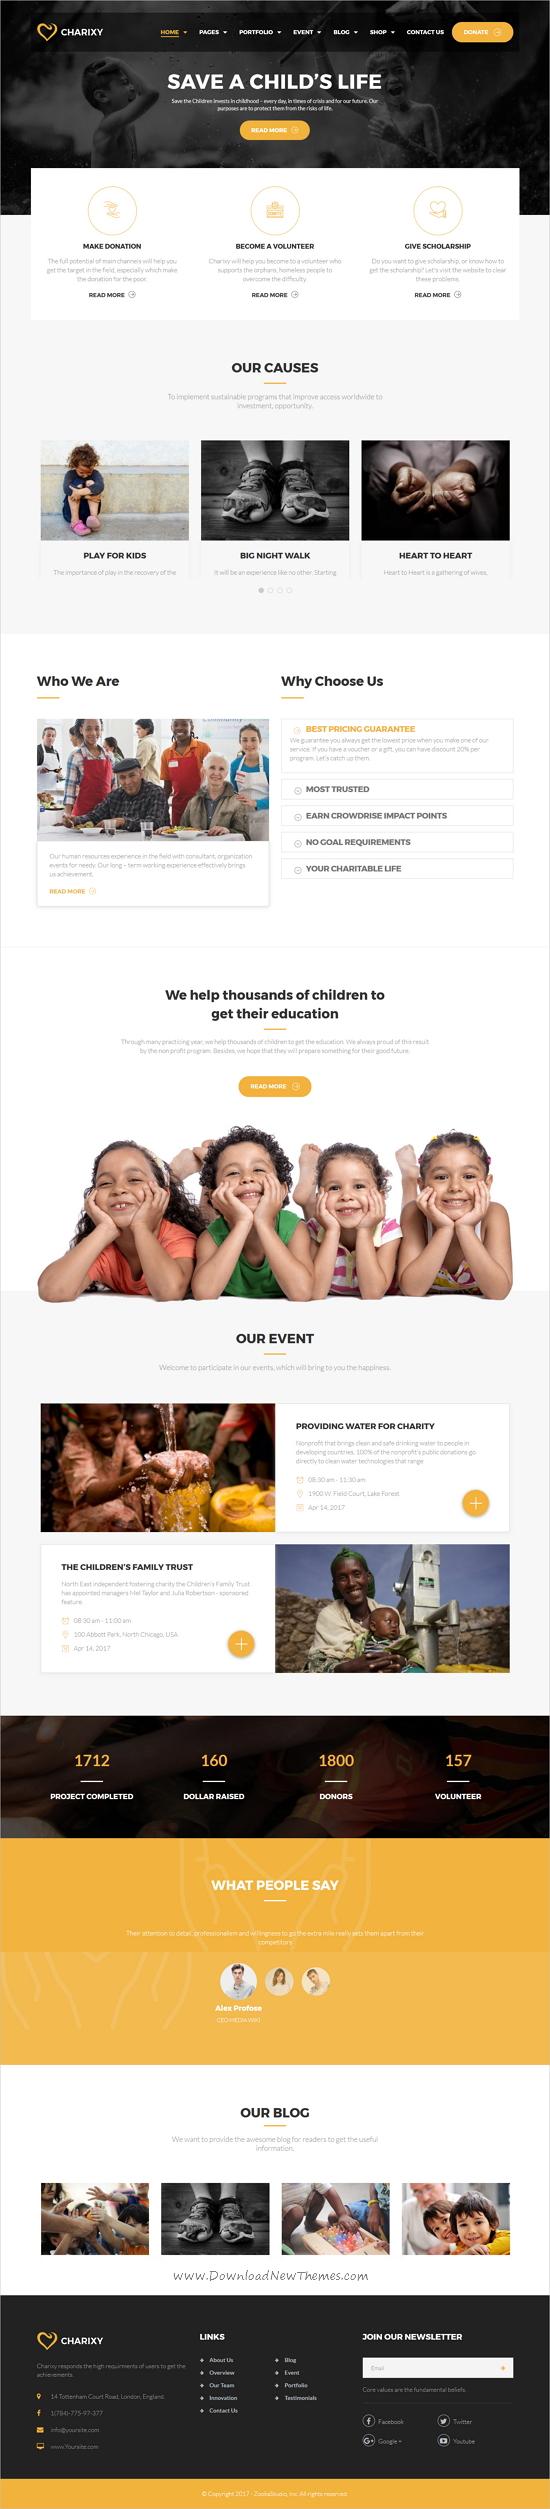 charity-events-modern-charity-fundraising-wordpress-theme